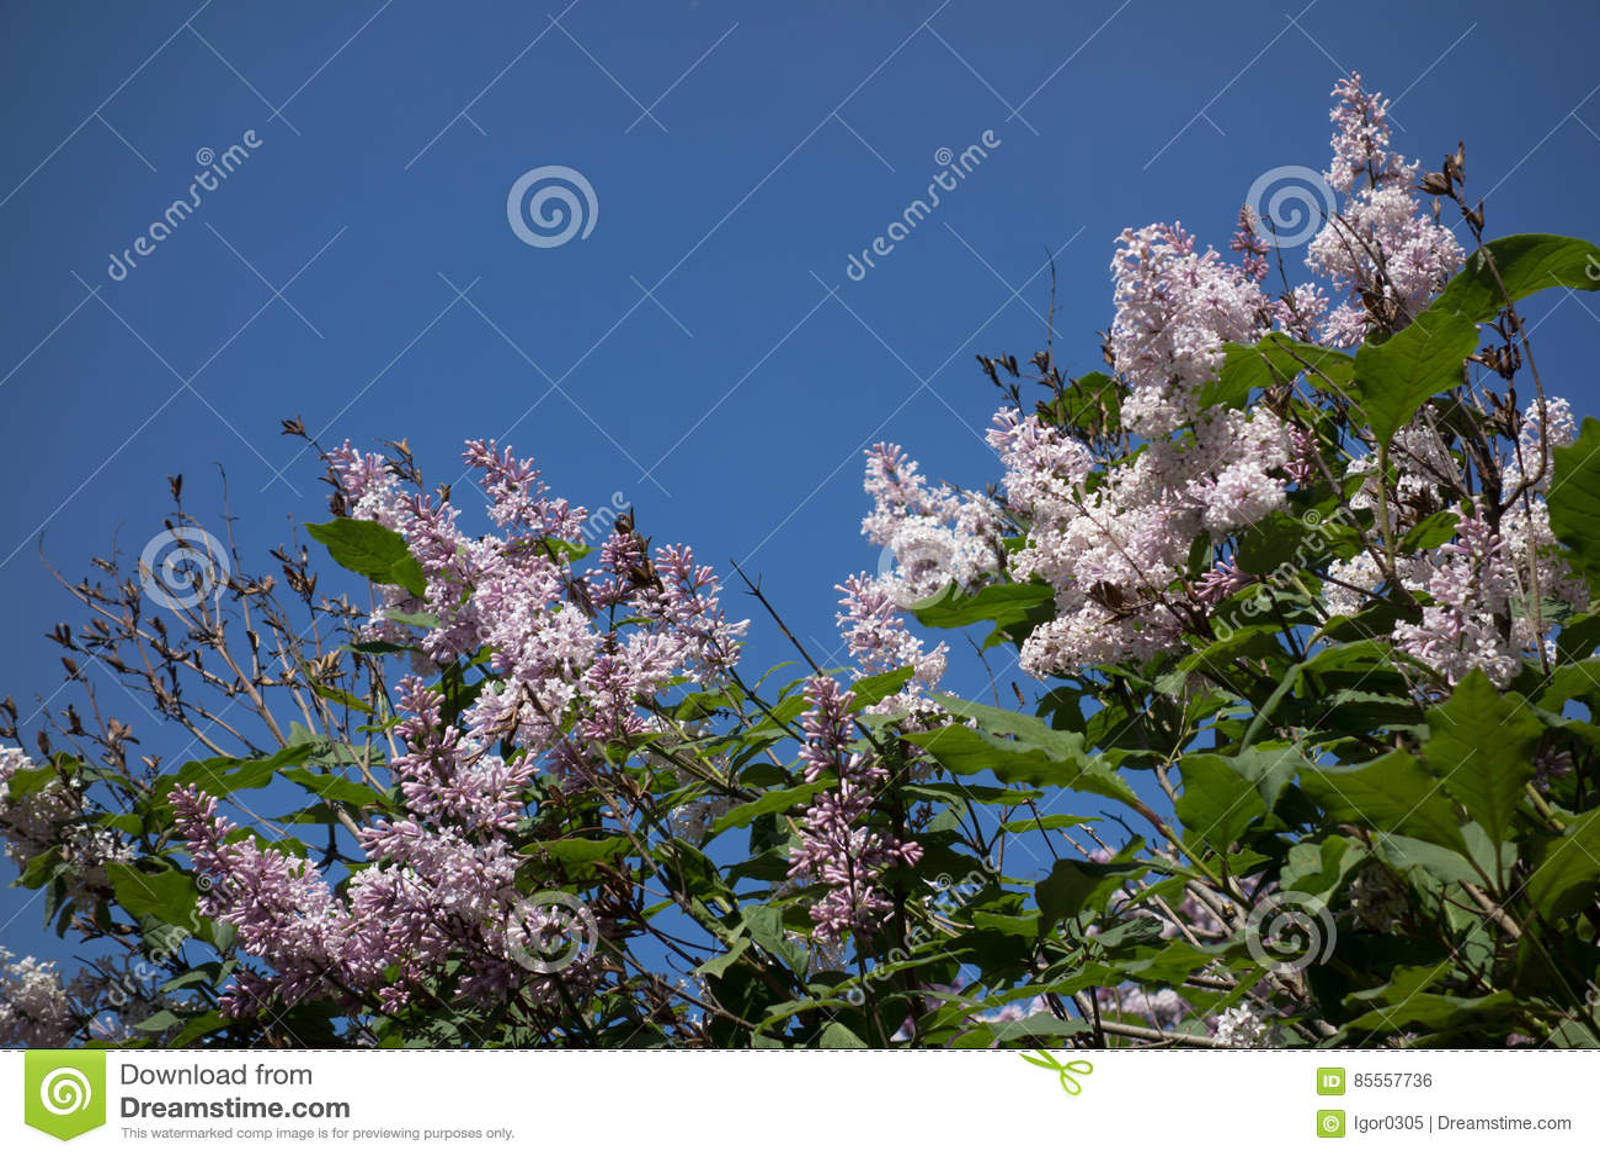 Blühende lila Blumen